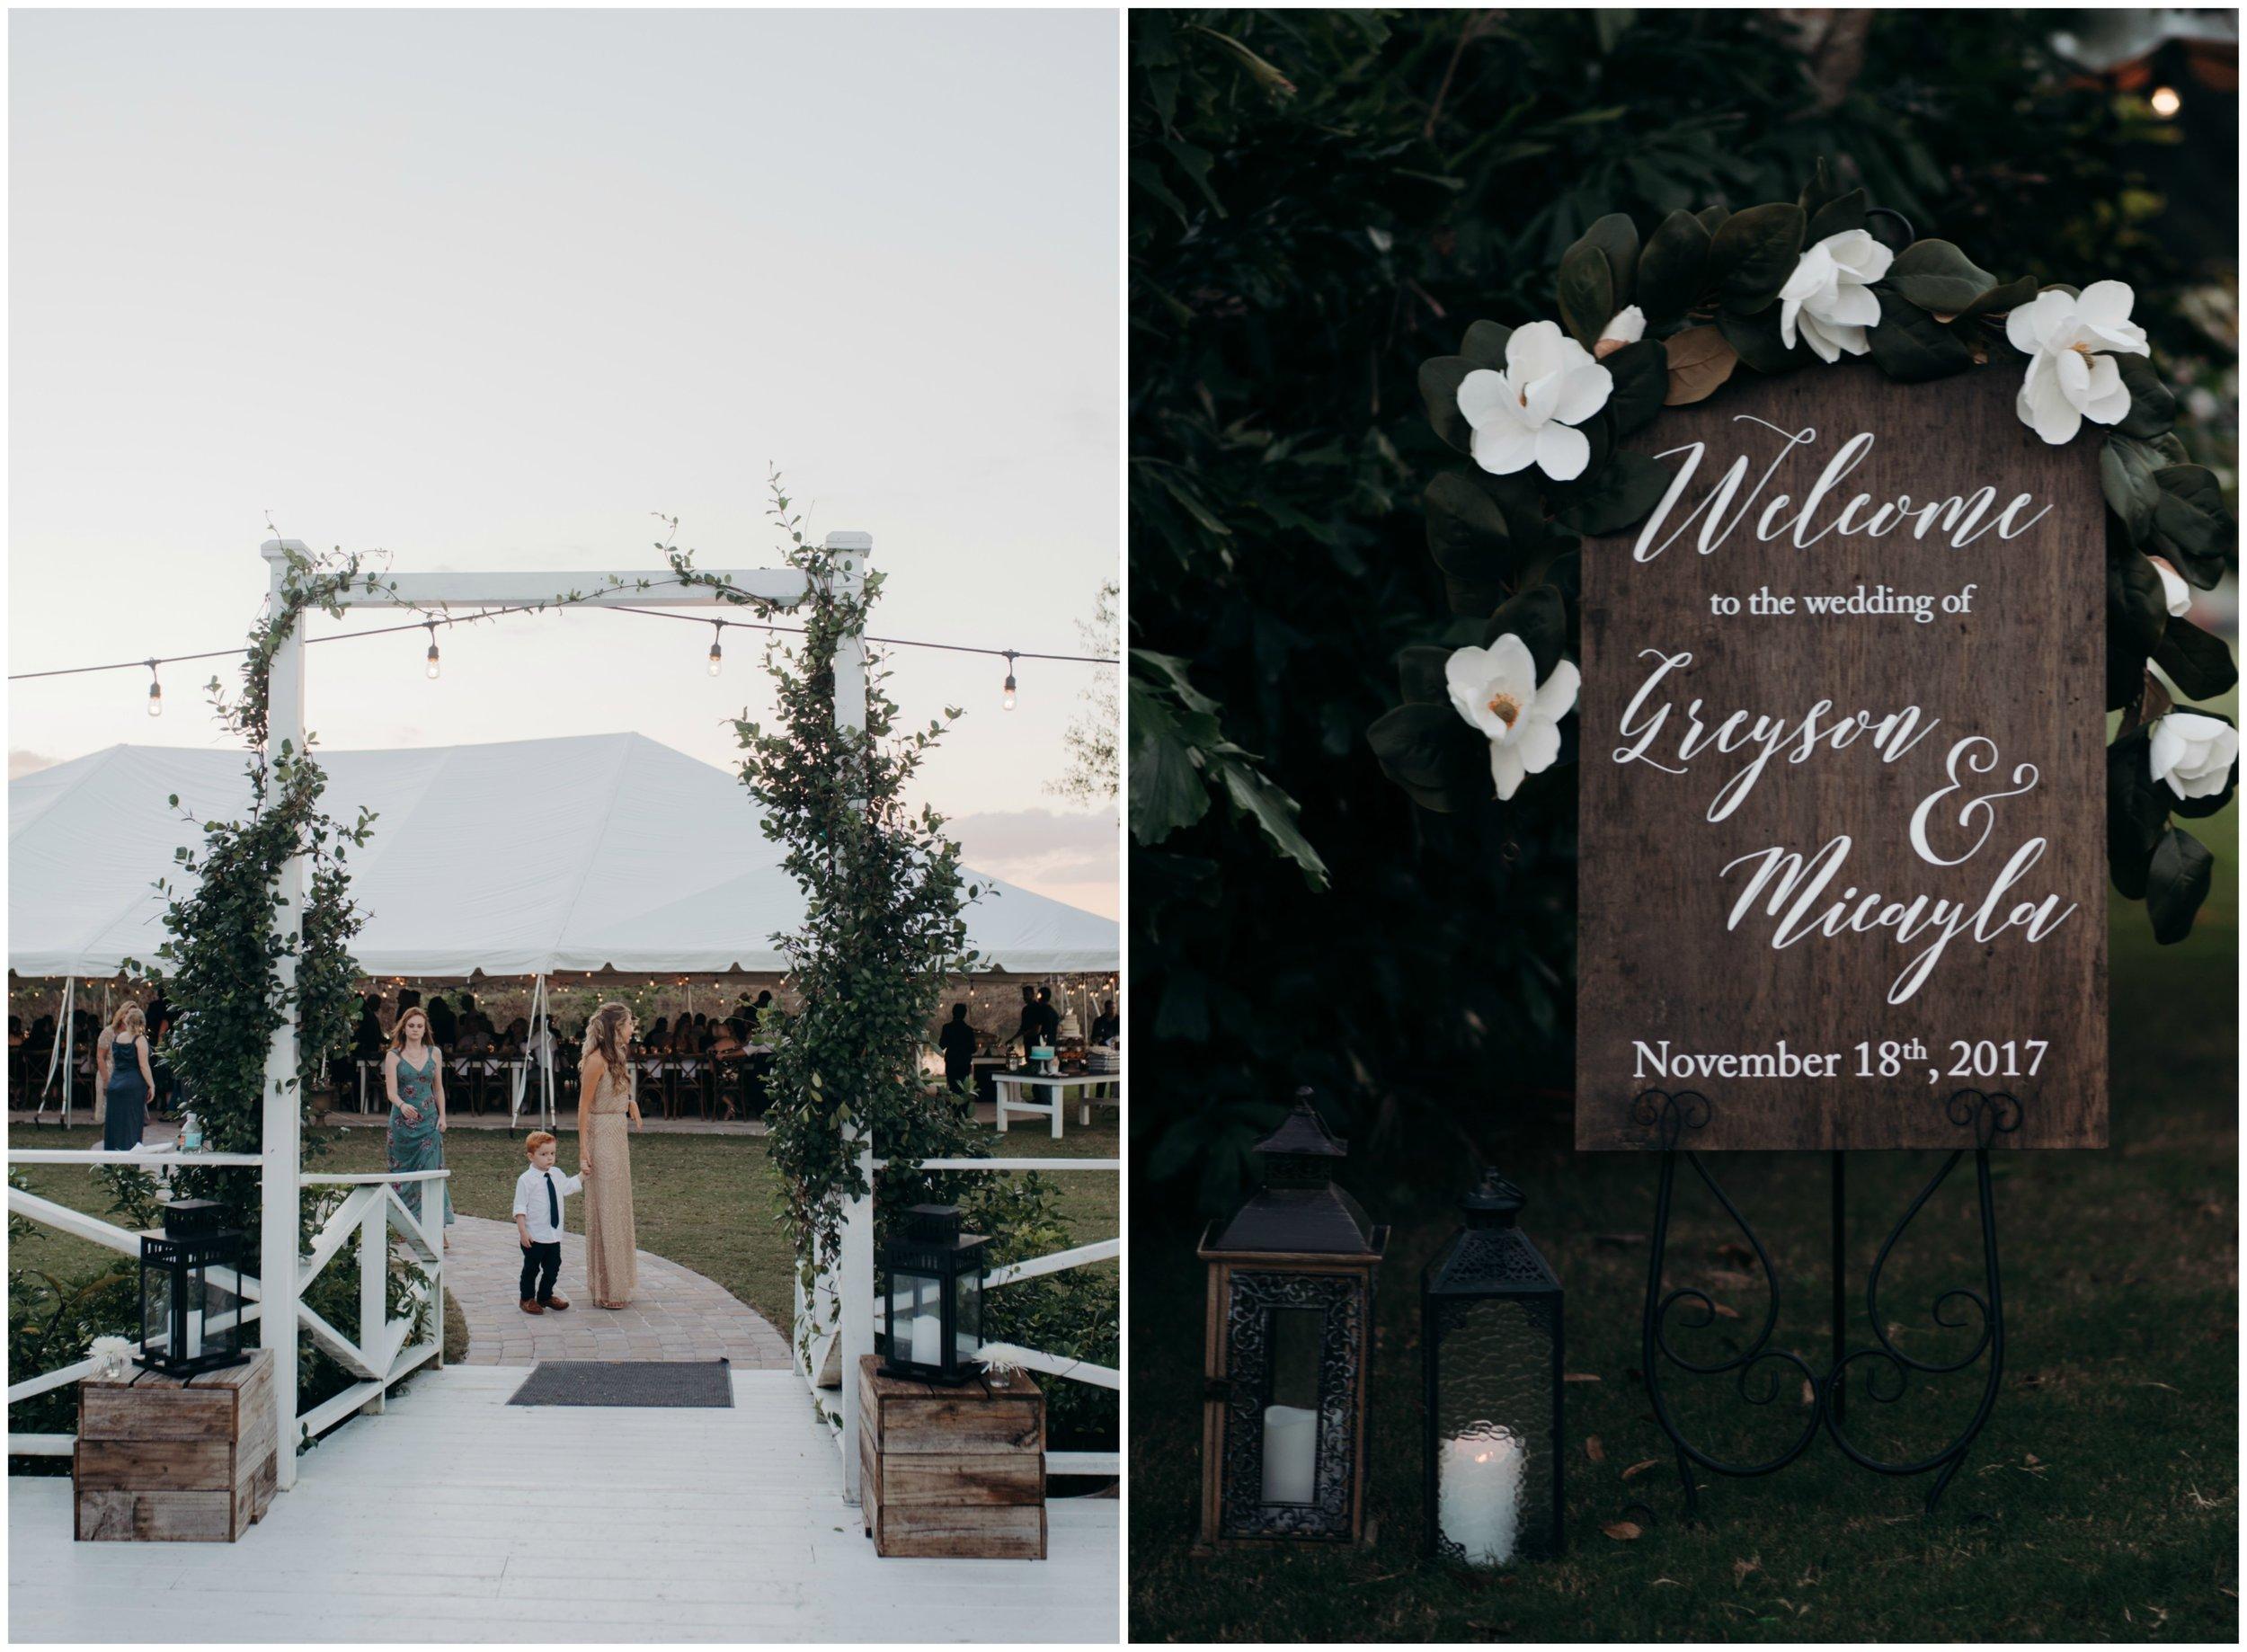 micayla-greyson-wedding-venue-details.jpg